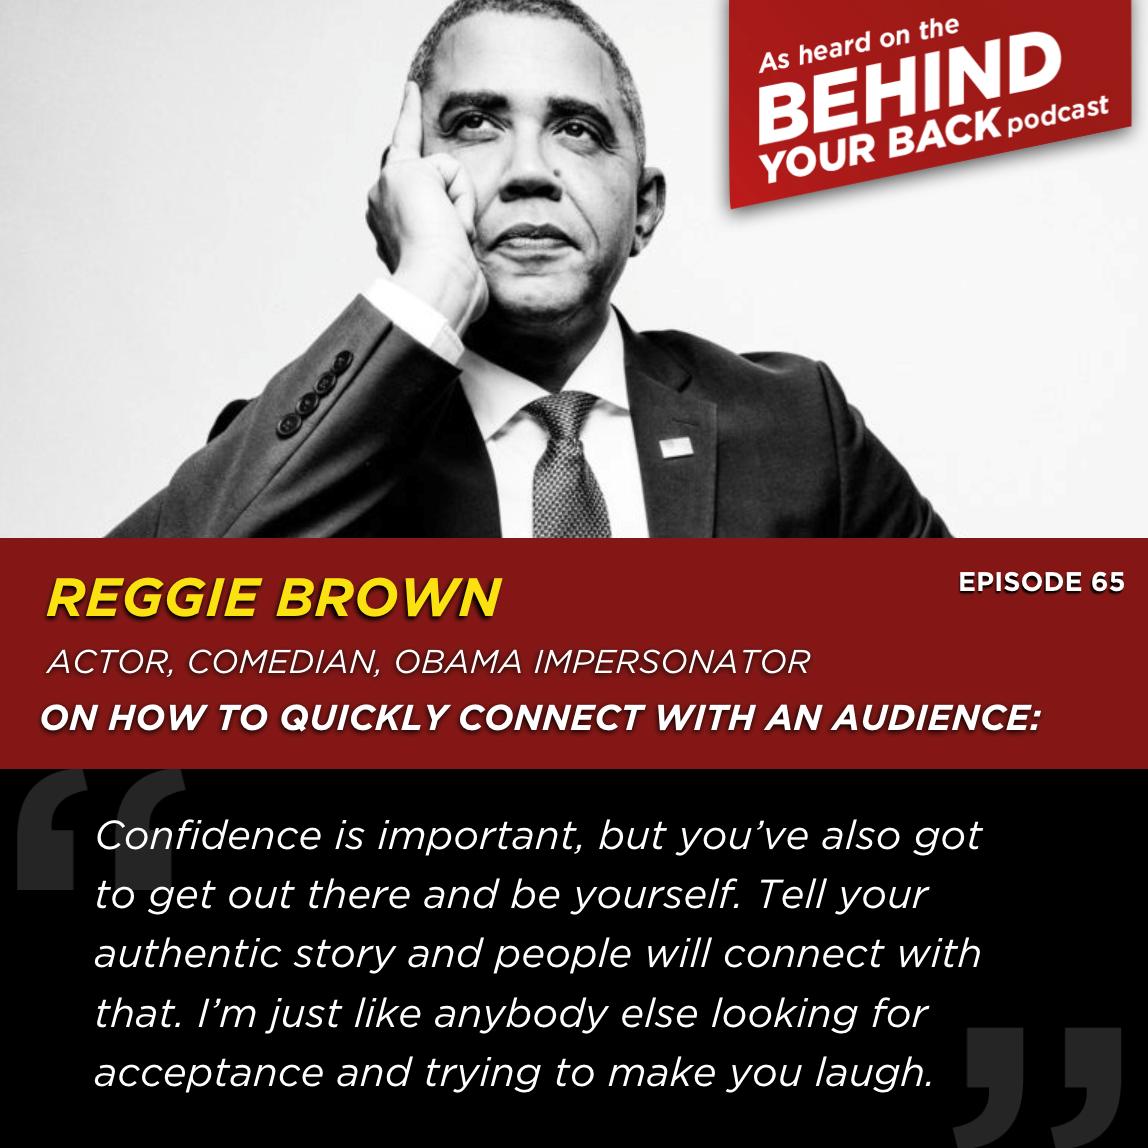 Episode 65 - Behind Your Back Podcast